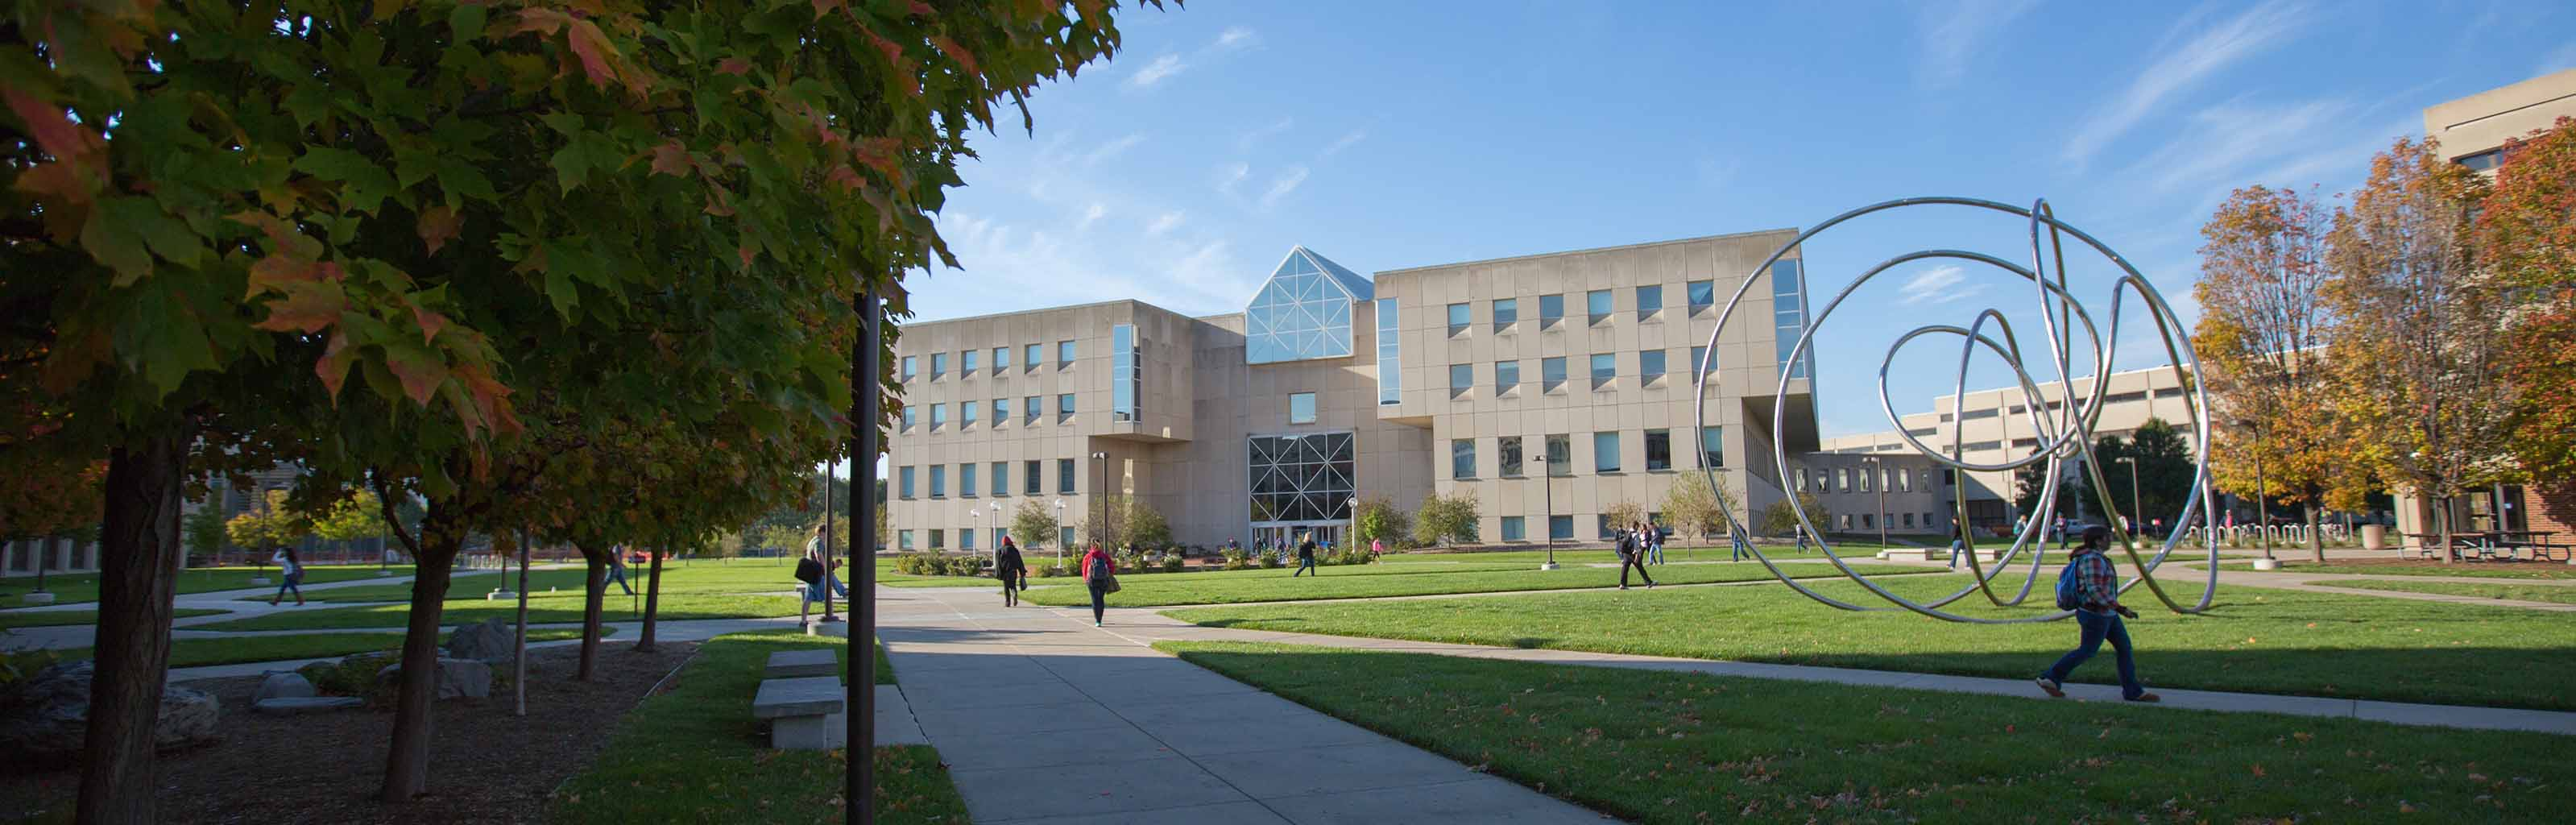 Iupui Fall 2022 Calendar.Iupui Scholarships For International Students Usa